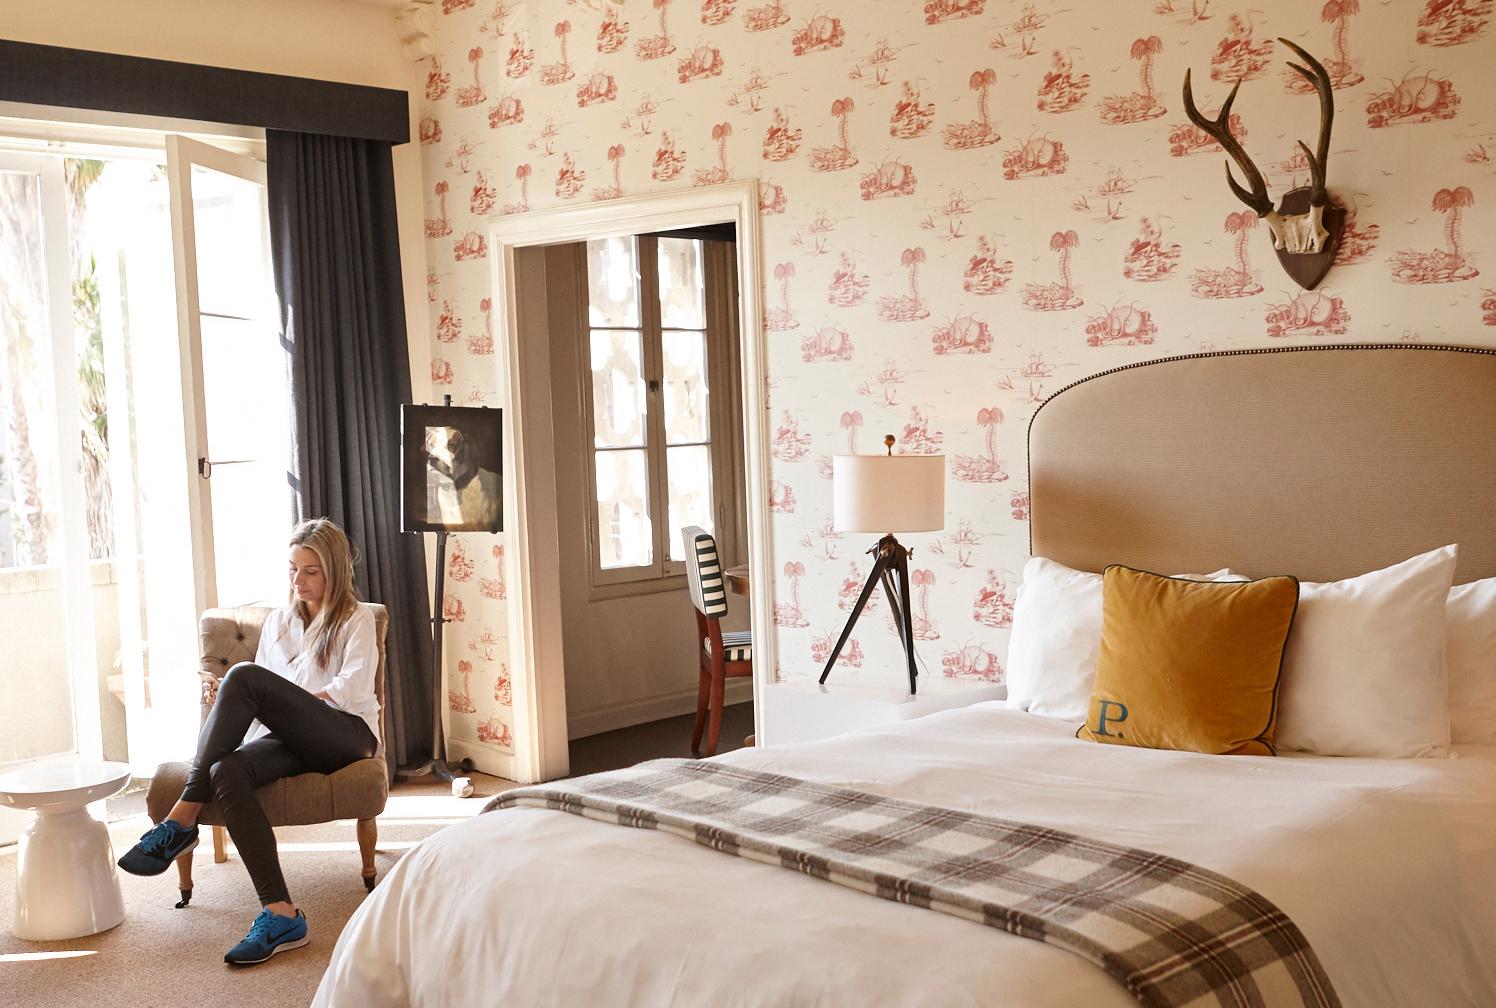 Is The Palihouse Santa Monica LA's Most Elegant Hotel?